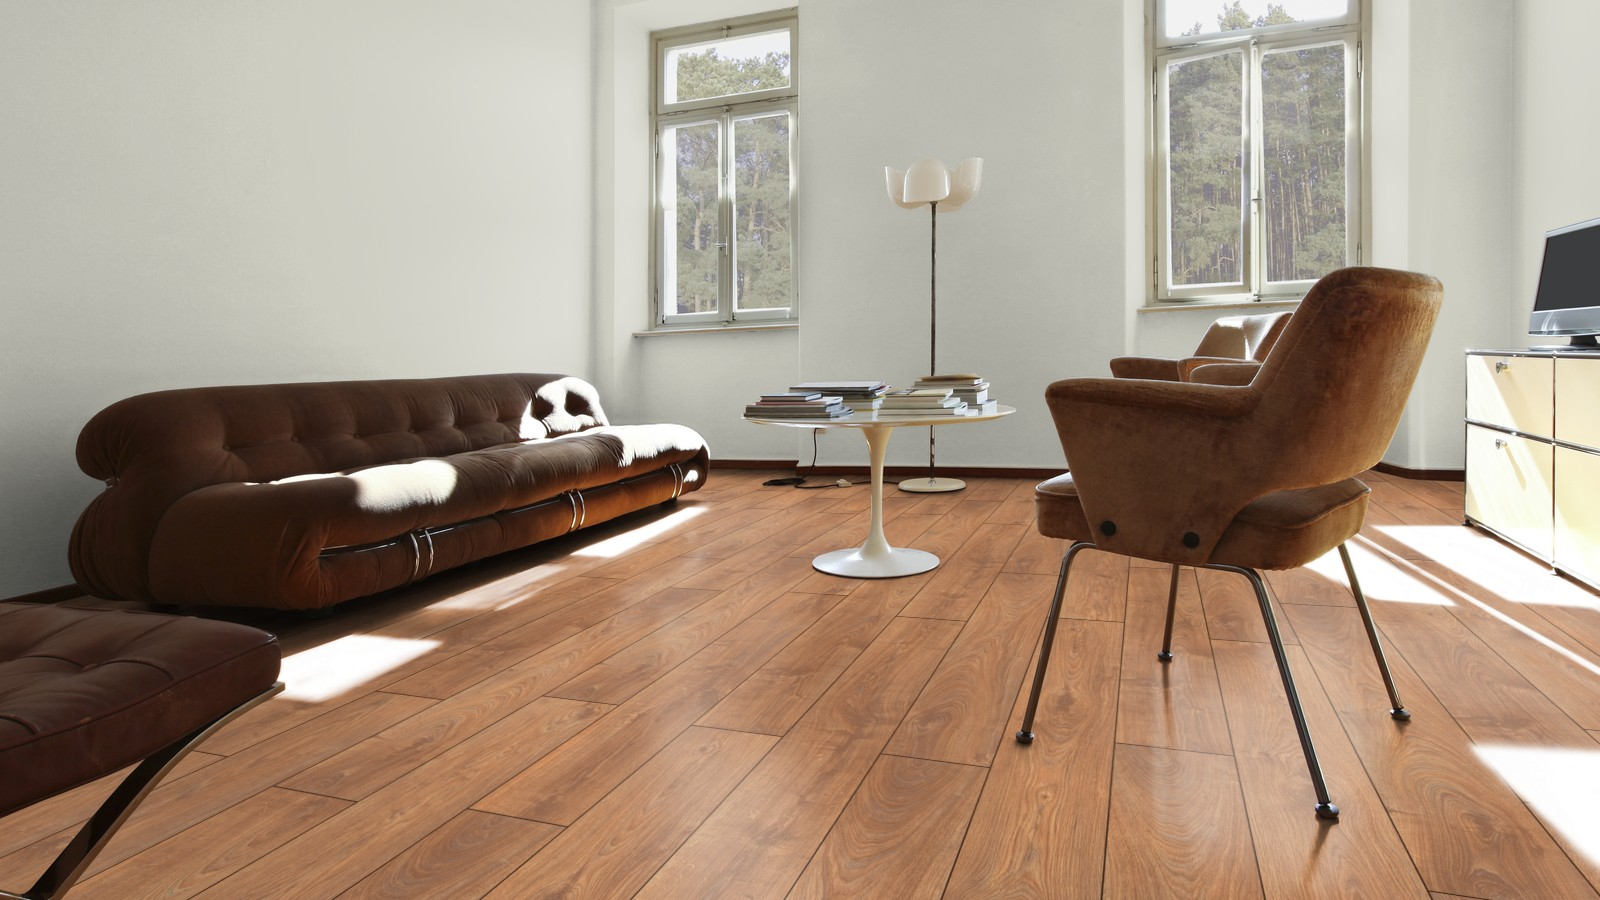 Flowing oak villeroy boch london premium laminate for Laminate flooring london